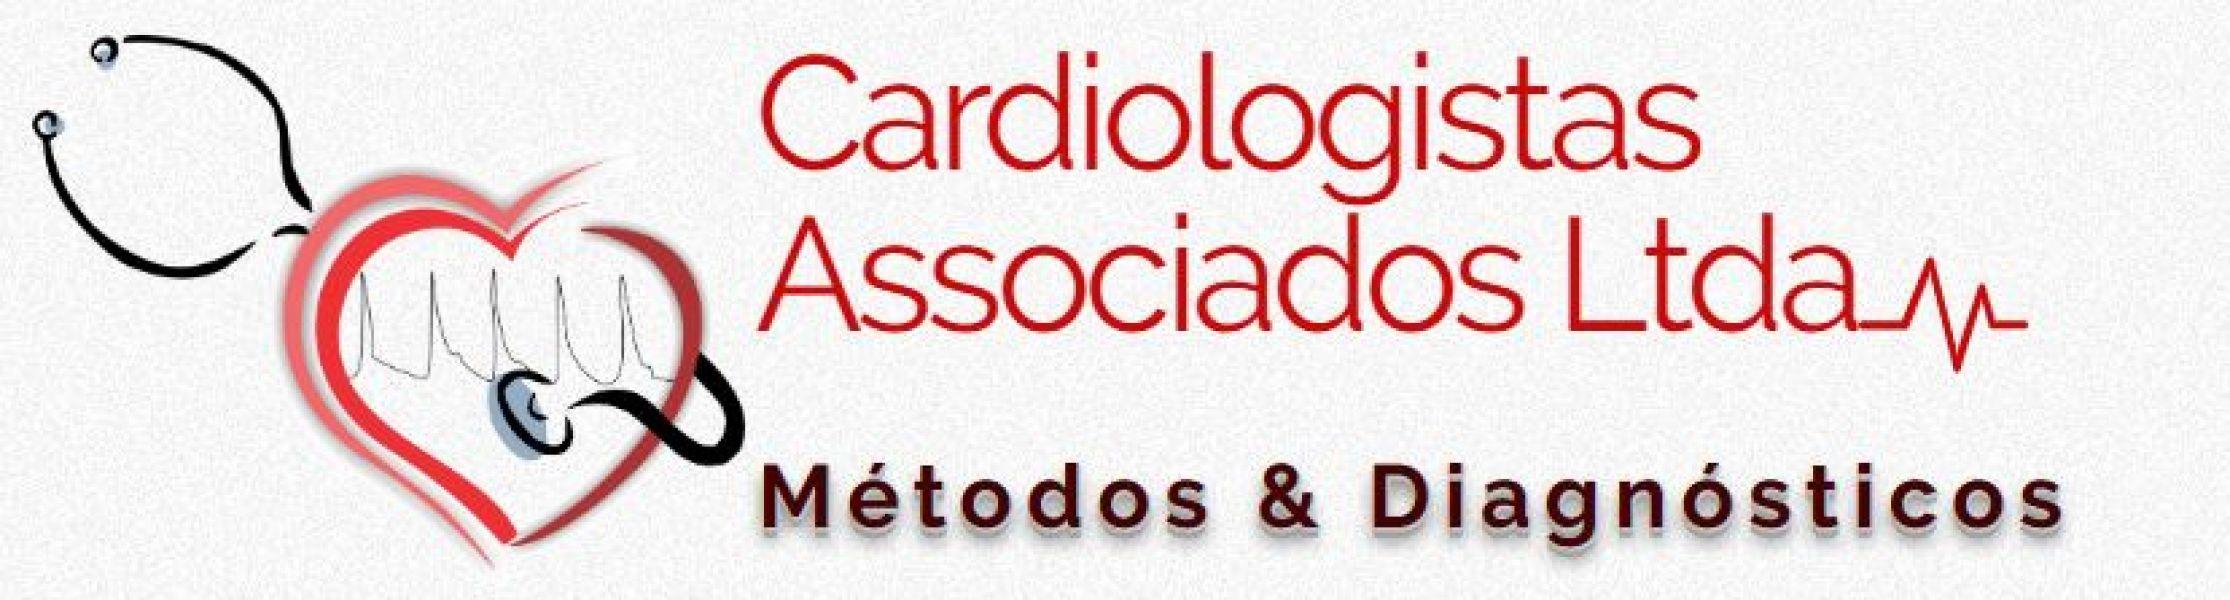 Cardiologista Associados Ltda